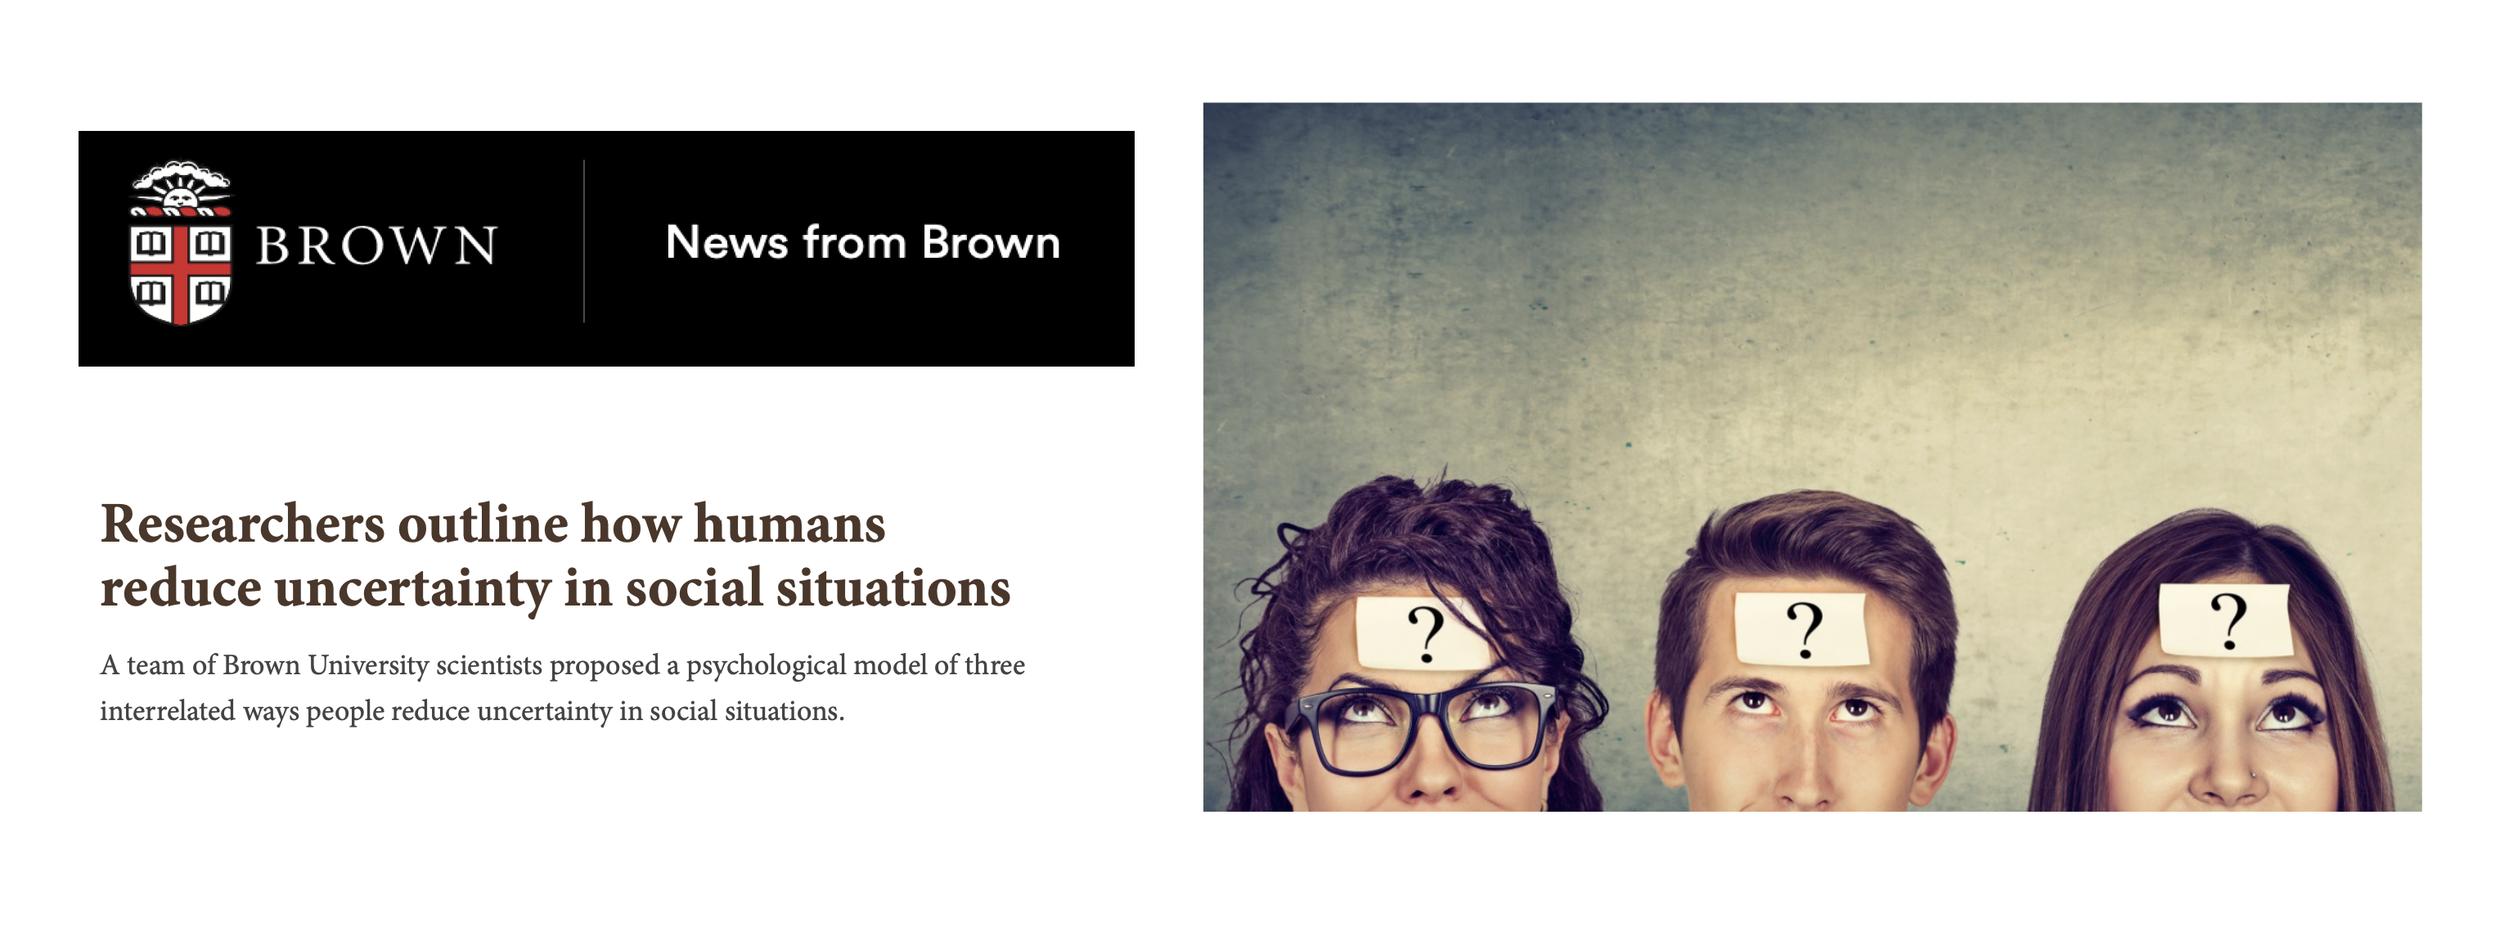 Brown.News.NHB.png